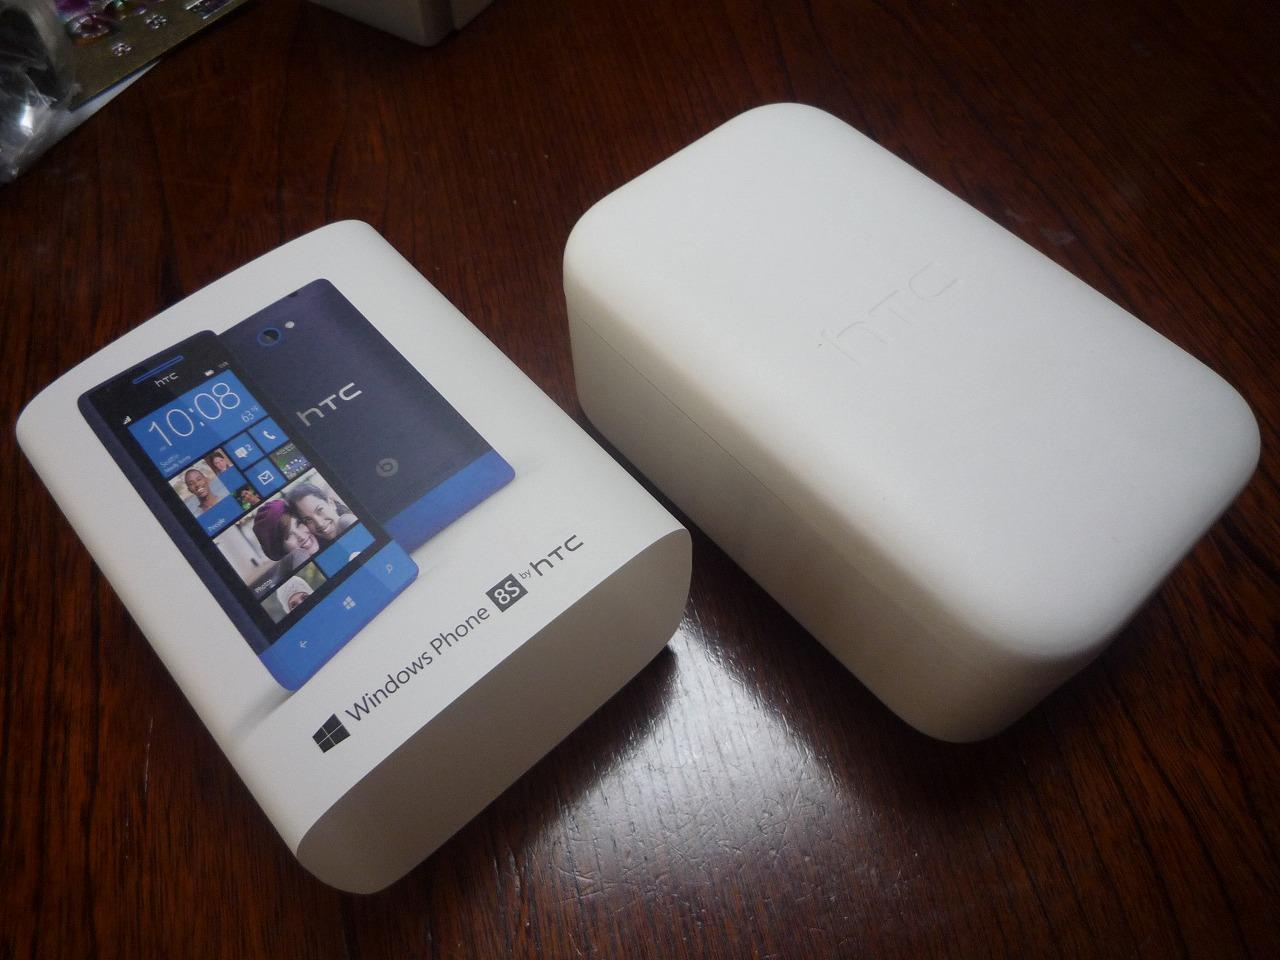 fetex phone 10b マニュアル